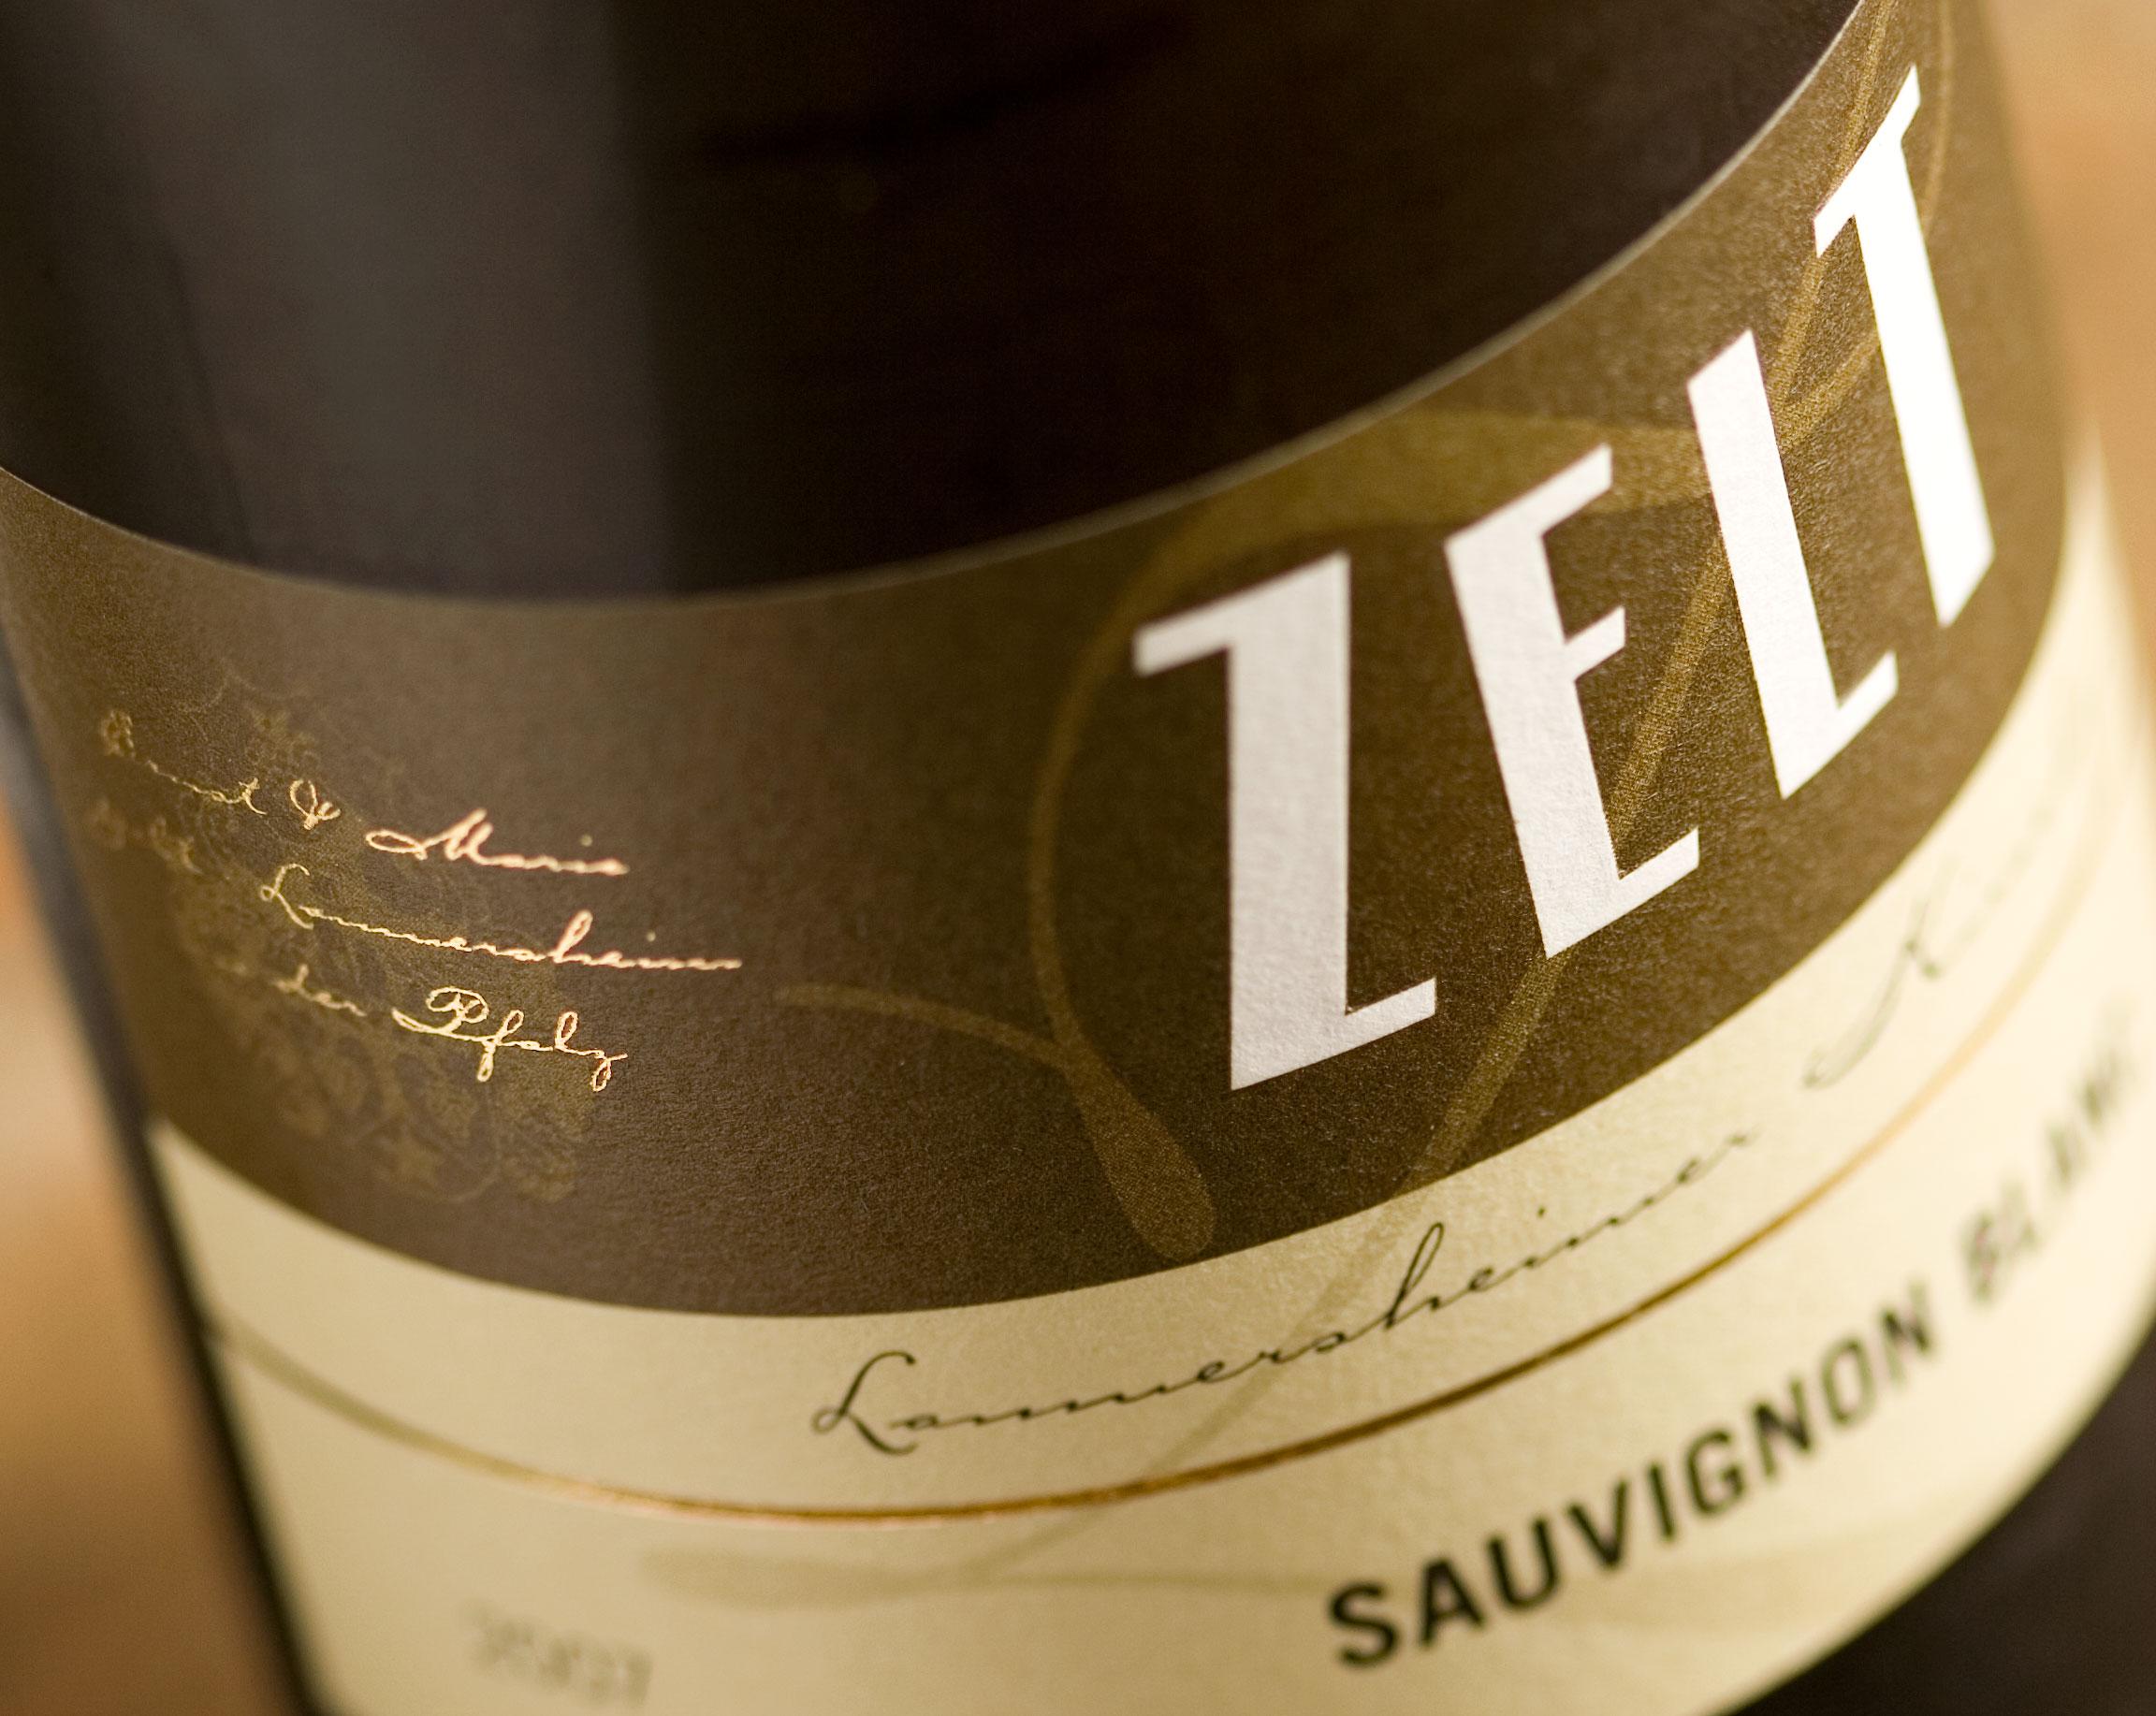 Etikett Weingut Zelt